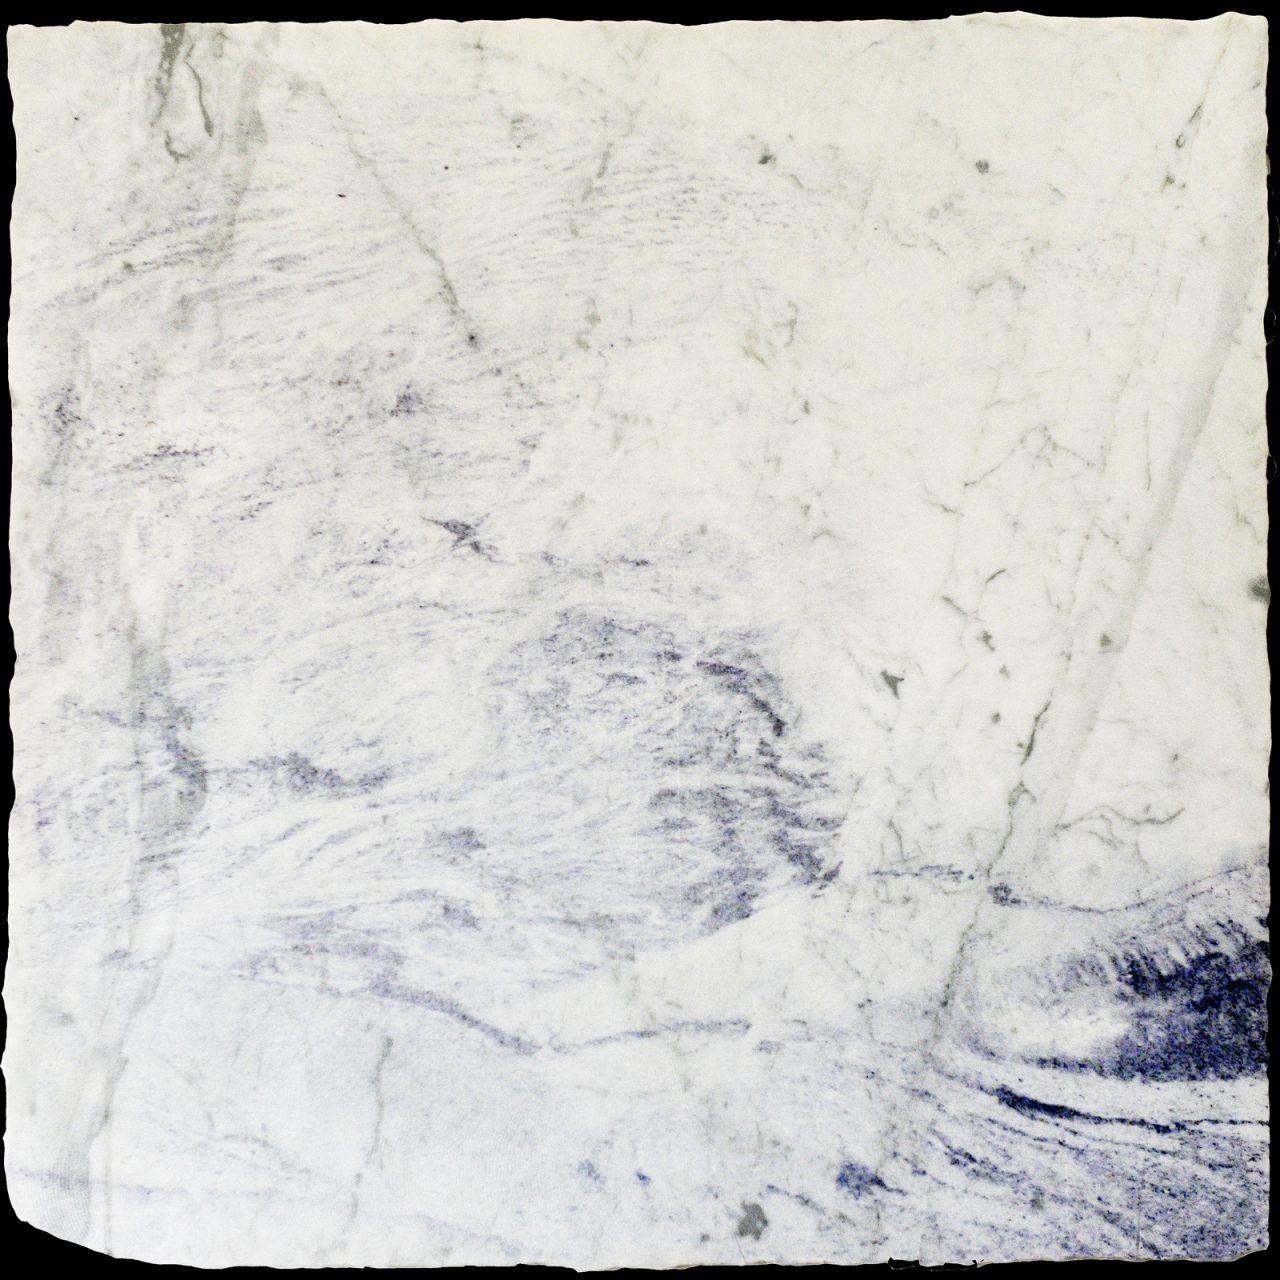 Toxic Craters III, Indonesia 2019, laser prints on Italian Carrara marble, 60,5 x 59 cm